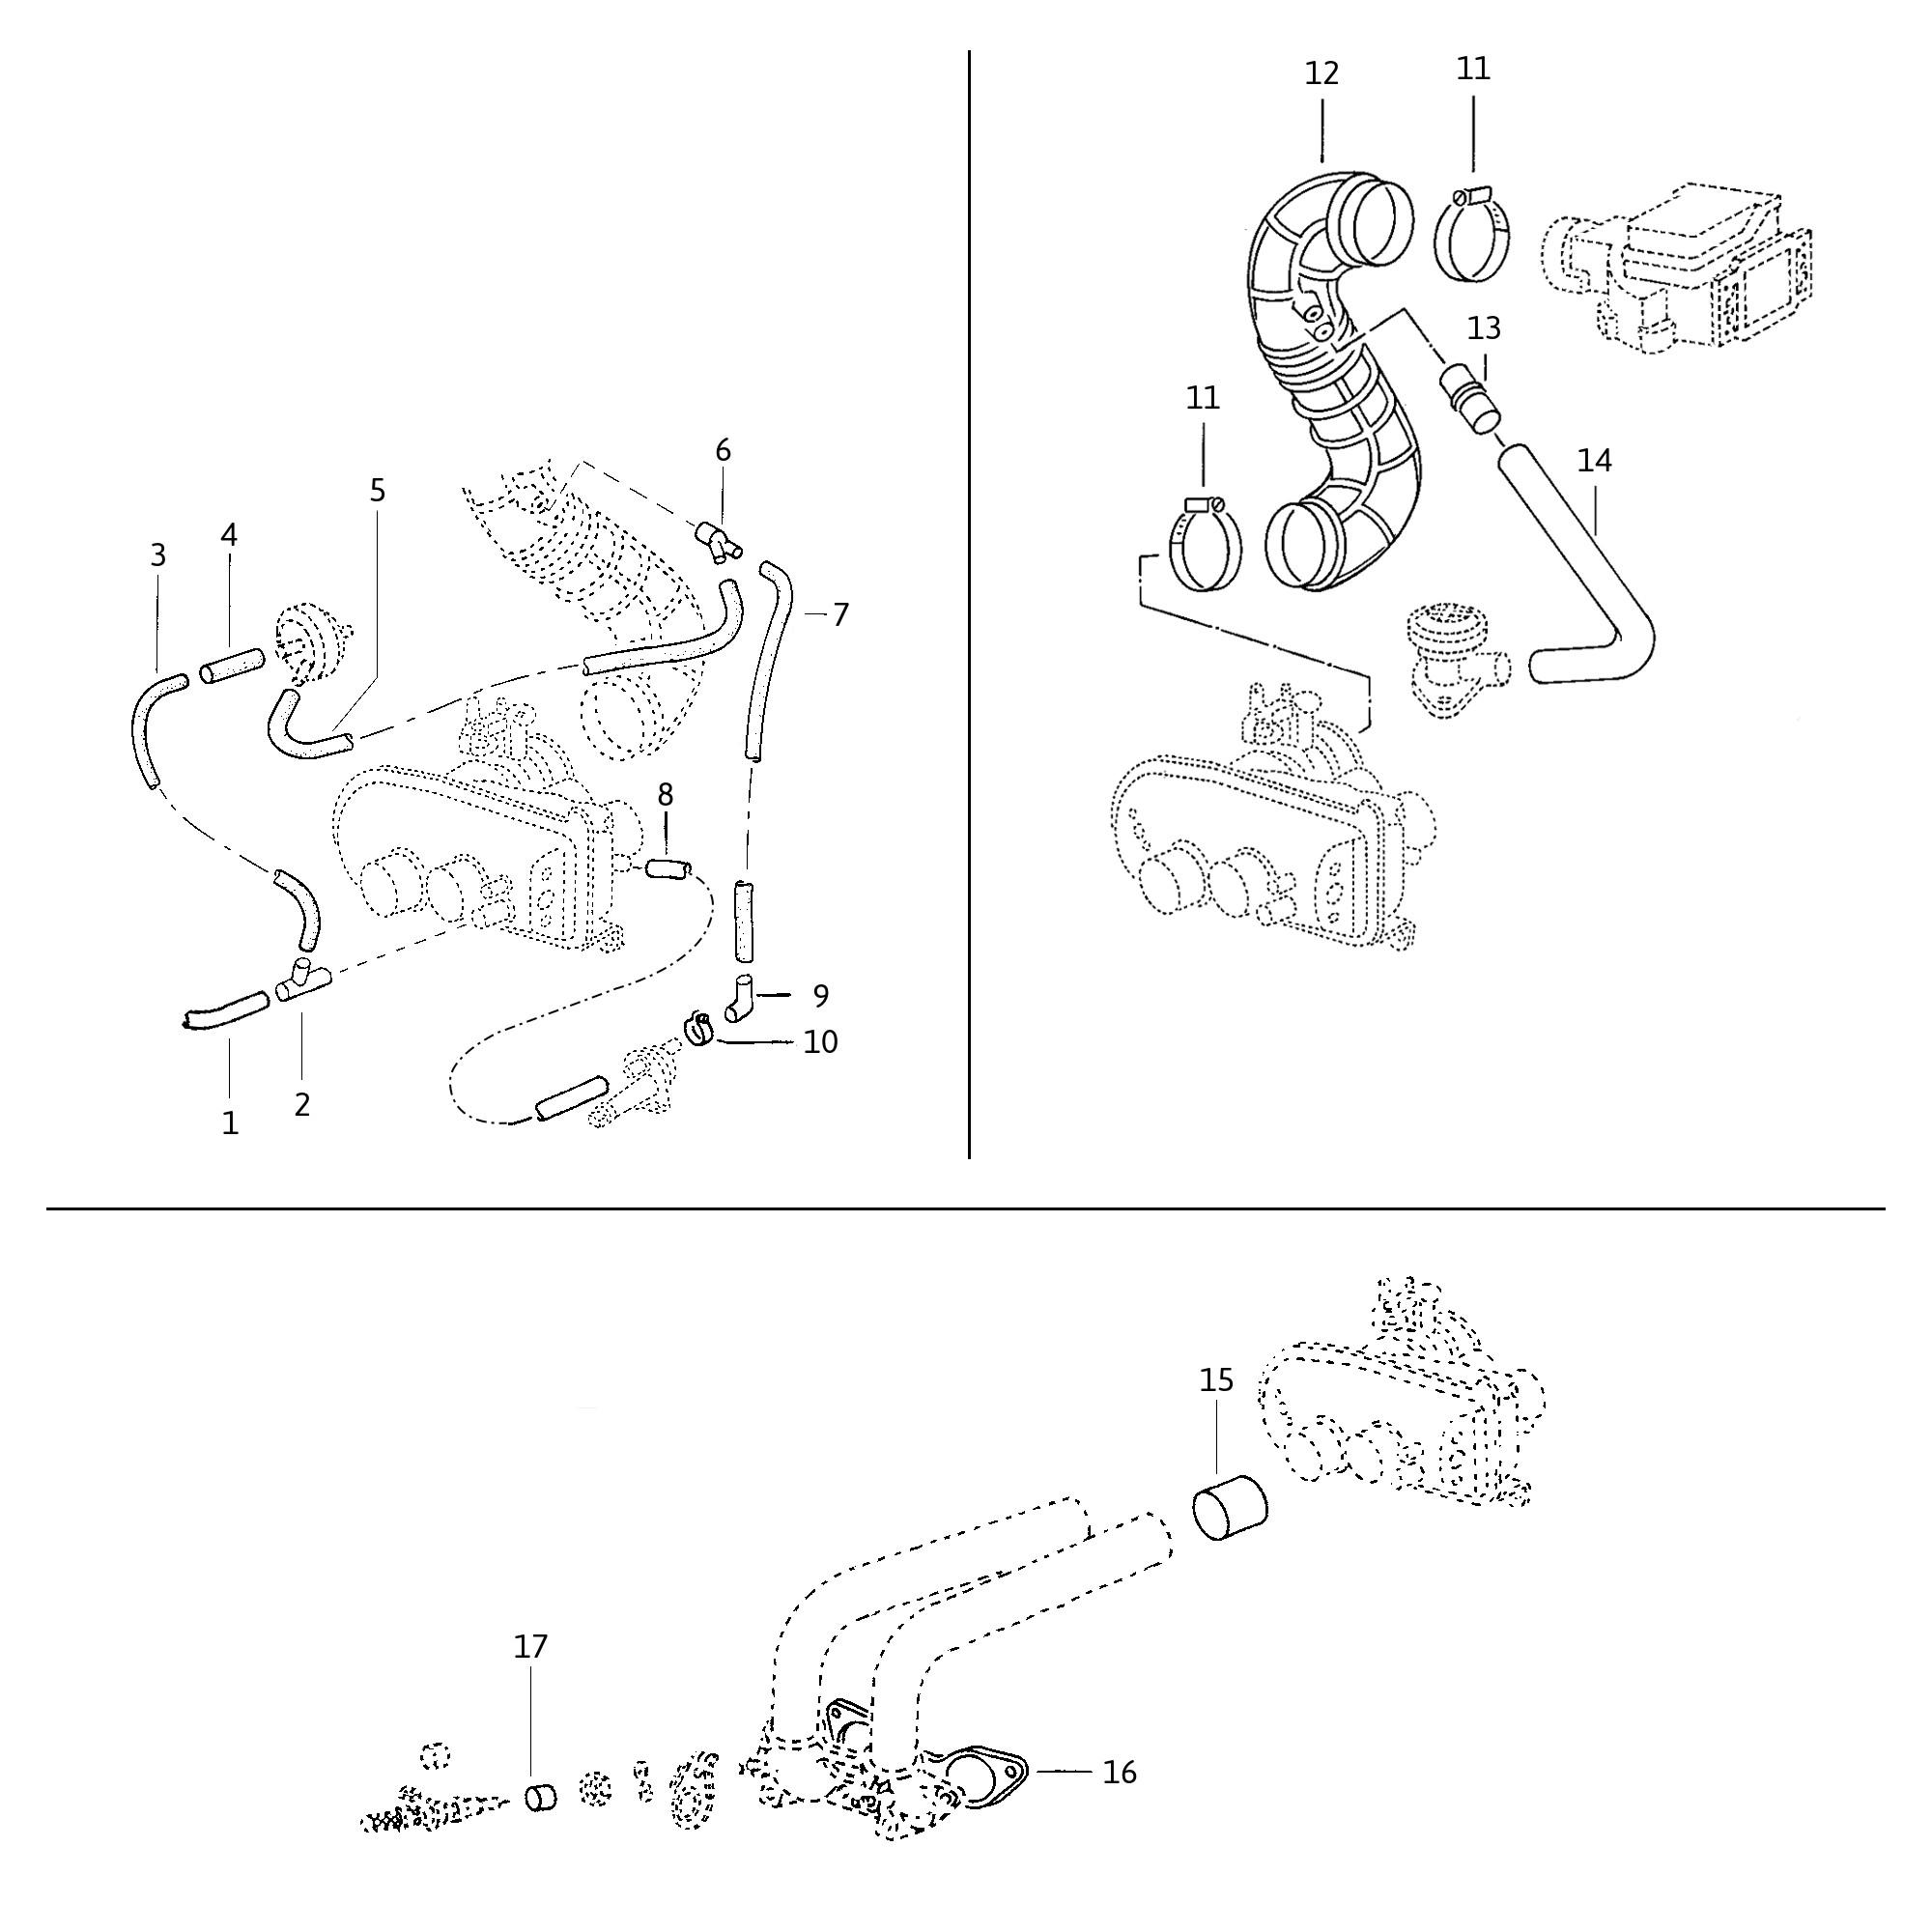 1976 Vw Transporter Vacuum Diagram Electrical Wiring Diagrams Alfa Romeo Bus Hose Guide 2015 Vehicles